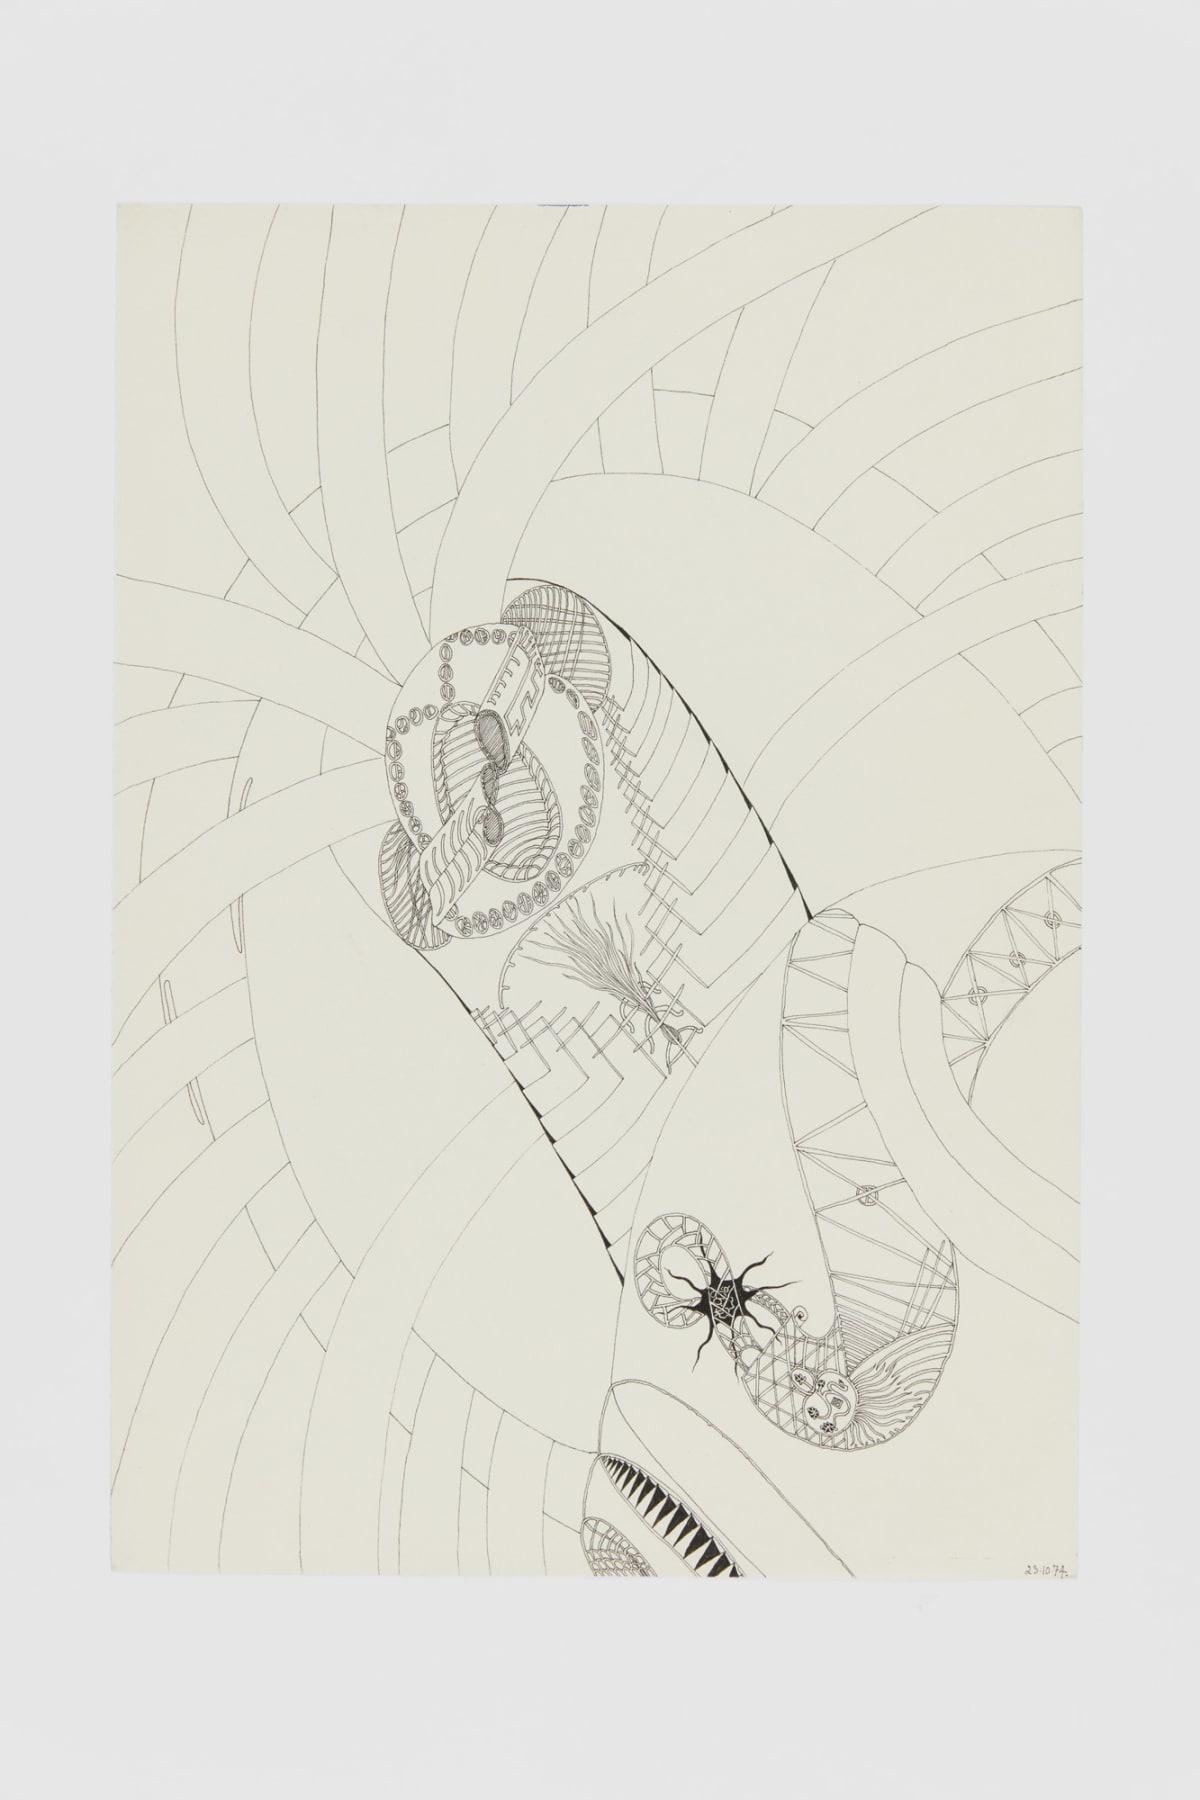 Ann CHURCHILL 23.10.74 (Daily drawings), 1974 Pen on paper 29.7 x 20.9 cm